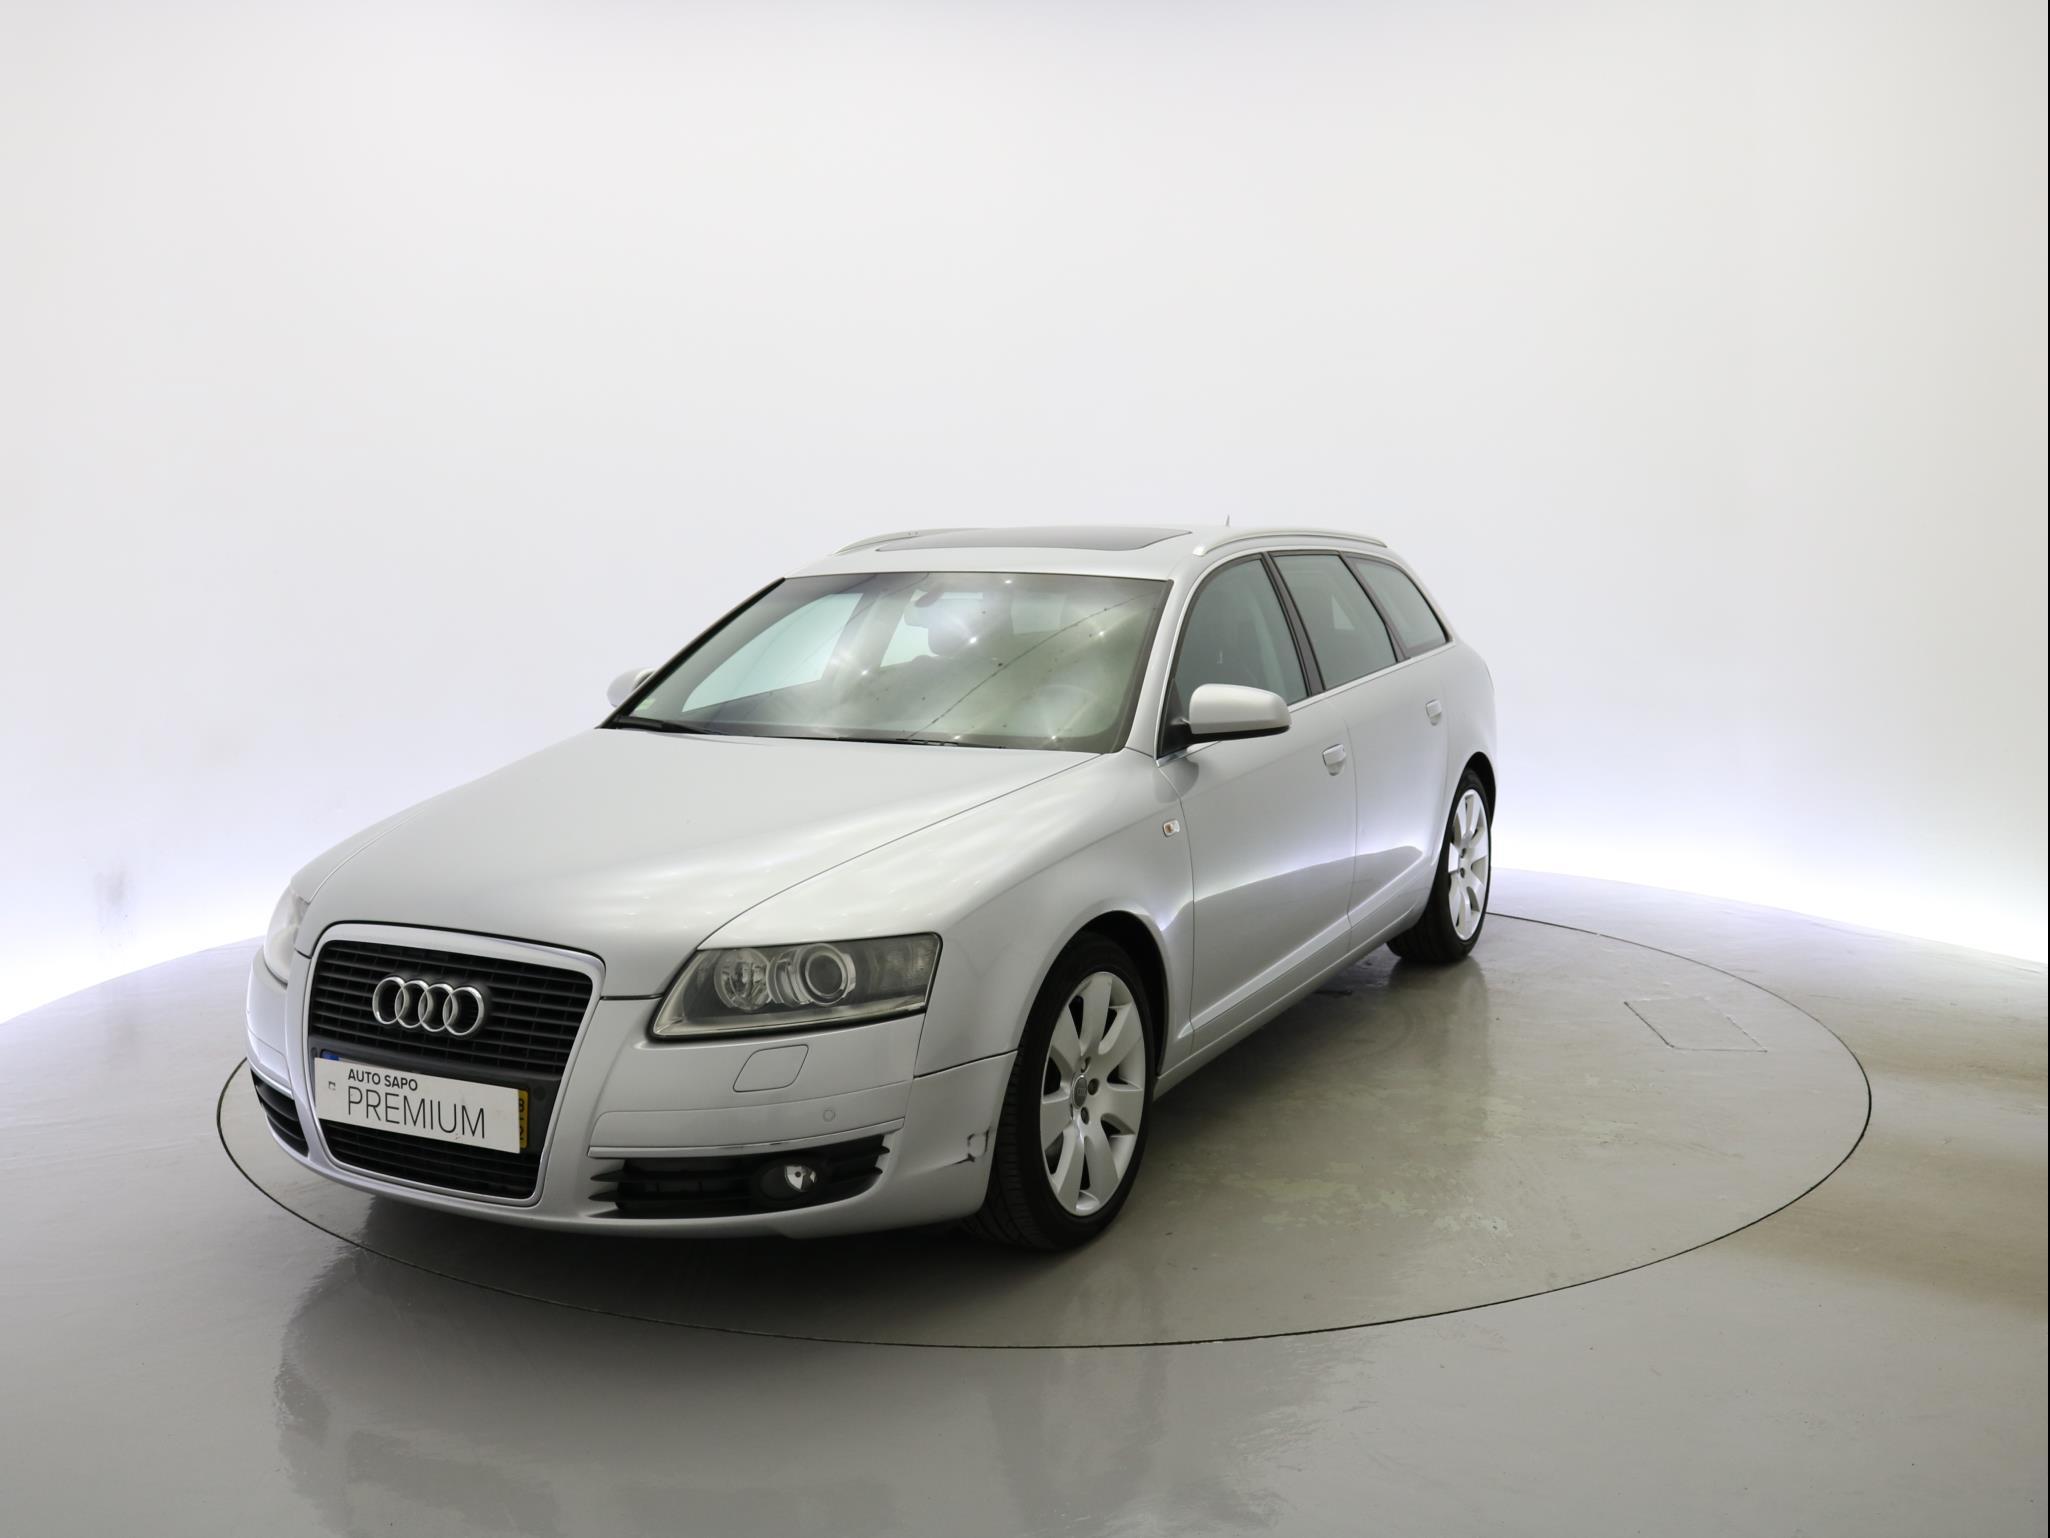 Audi A6 Avant 2.7 TDi V6 Exclusive multi